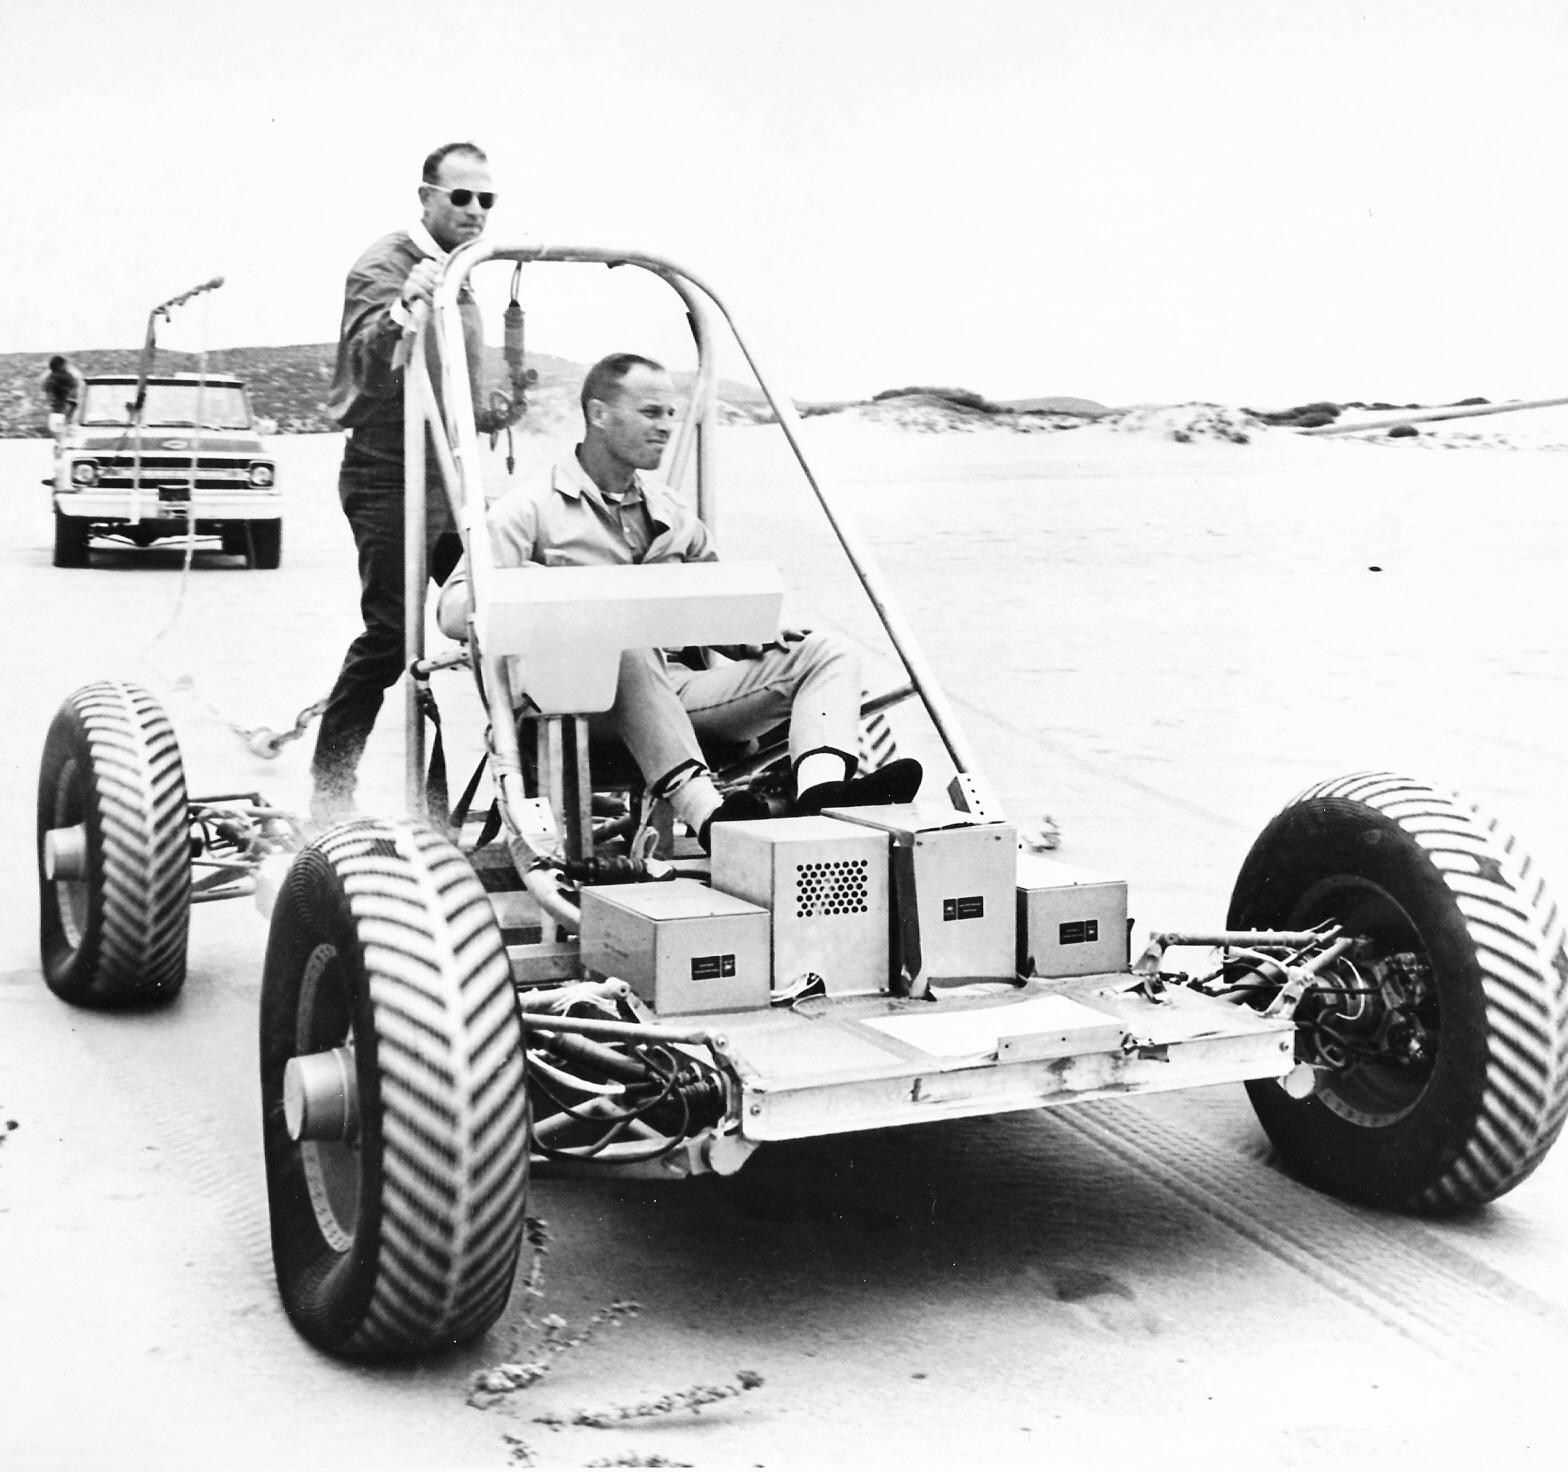 En 1971 prototype fra GM for en Dual Mode Lunar Rover, her under testing i California.